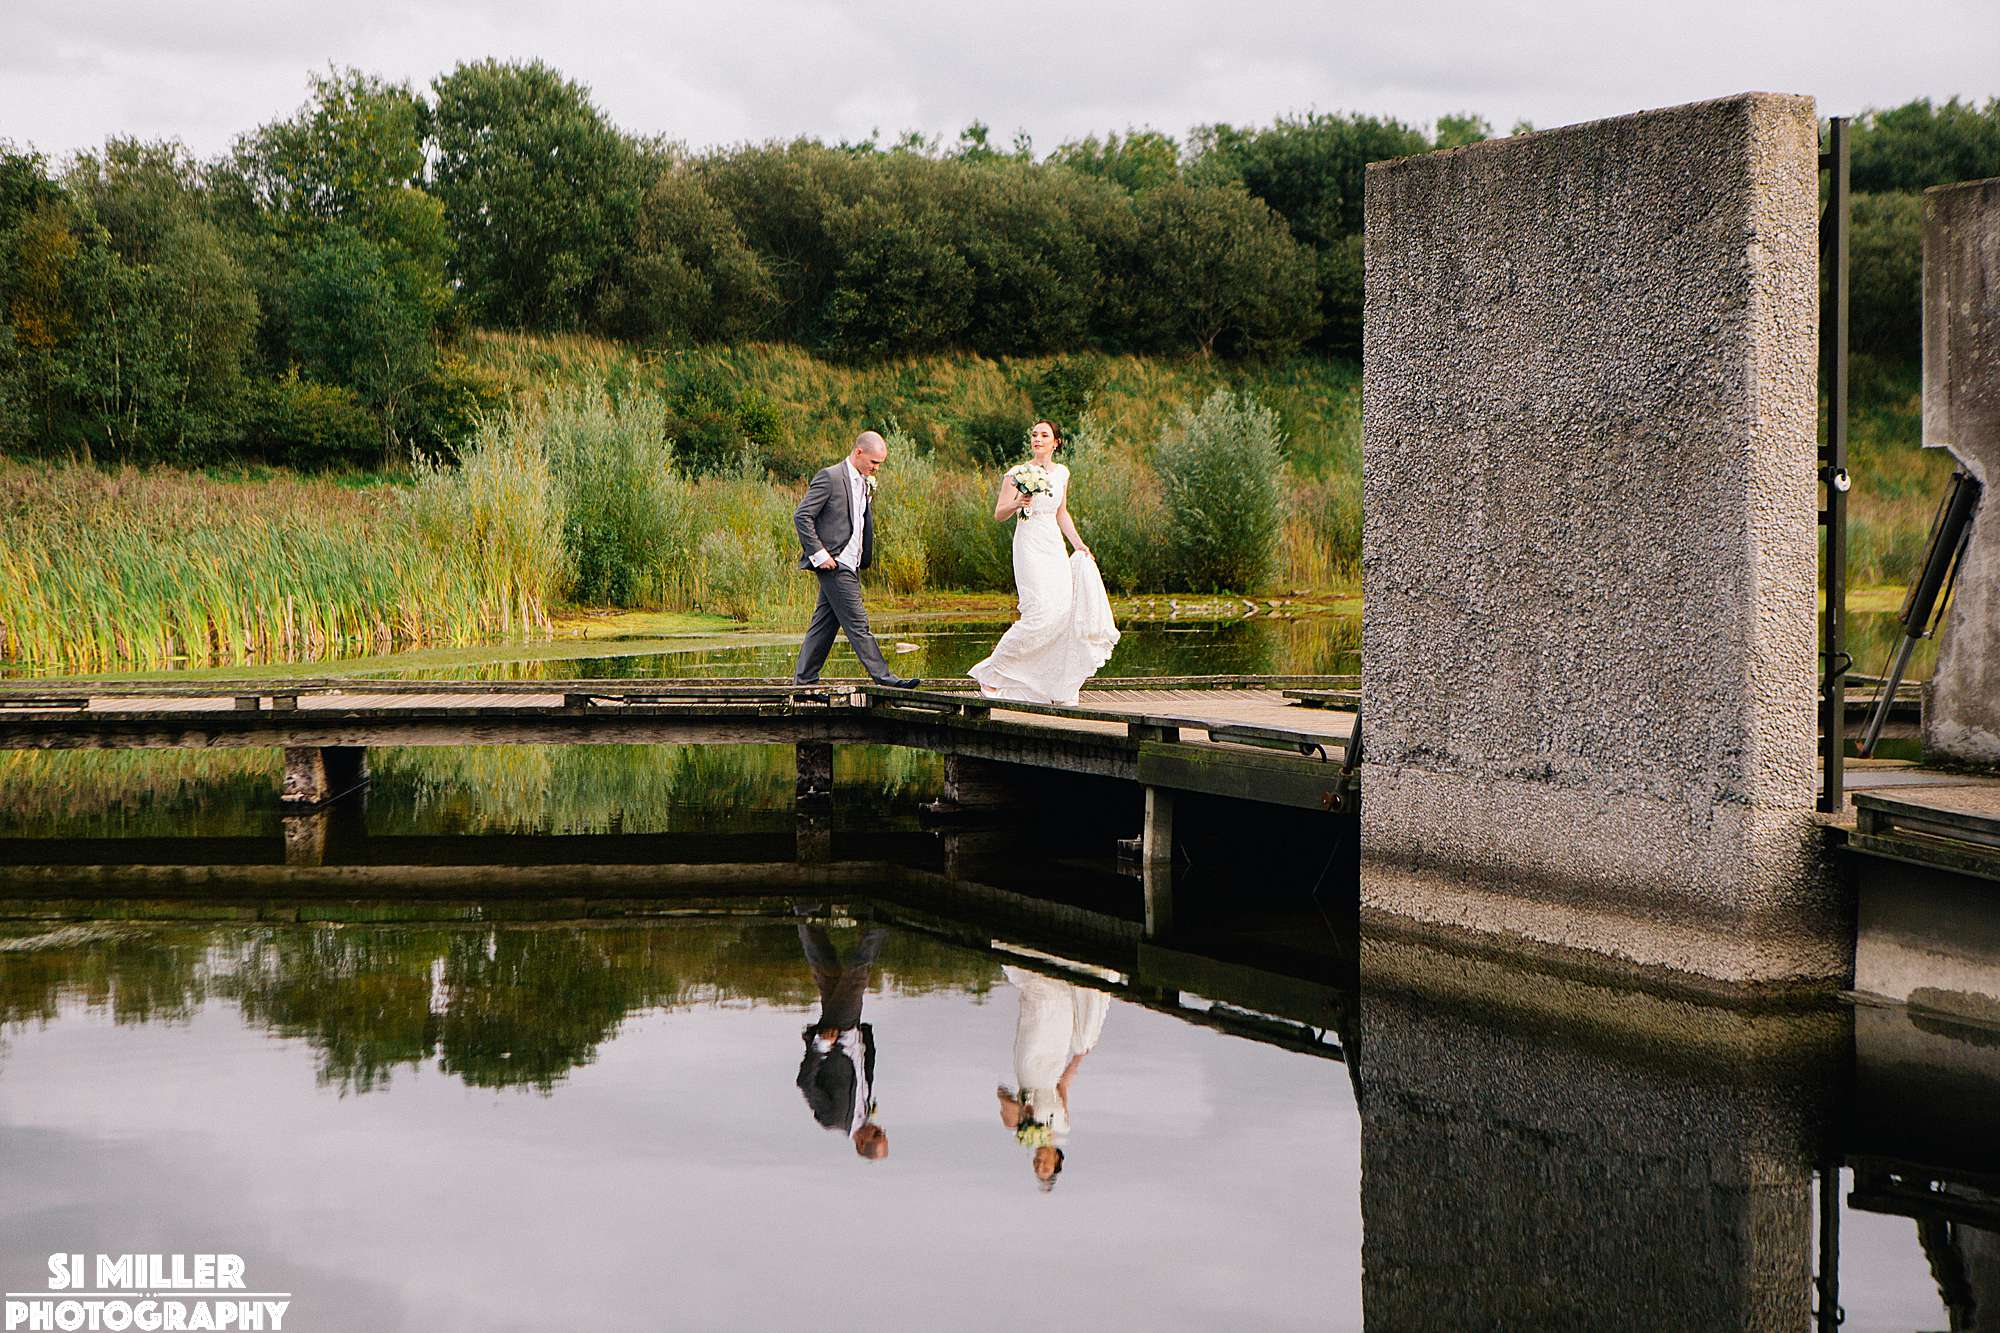 Bride and groom walking on jetty to brockholes floating island at brockholes nature reserve